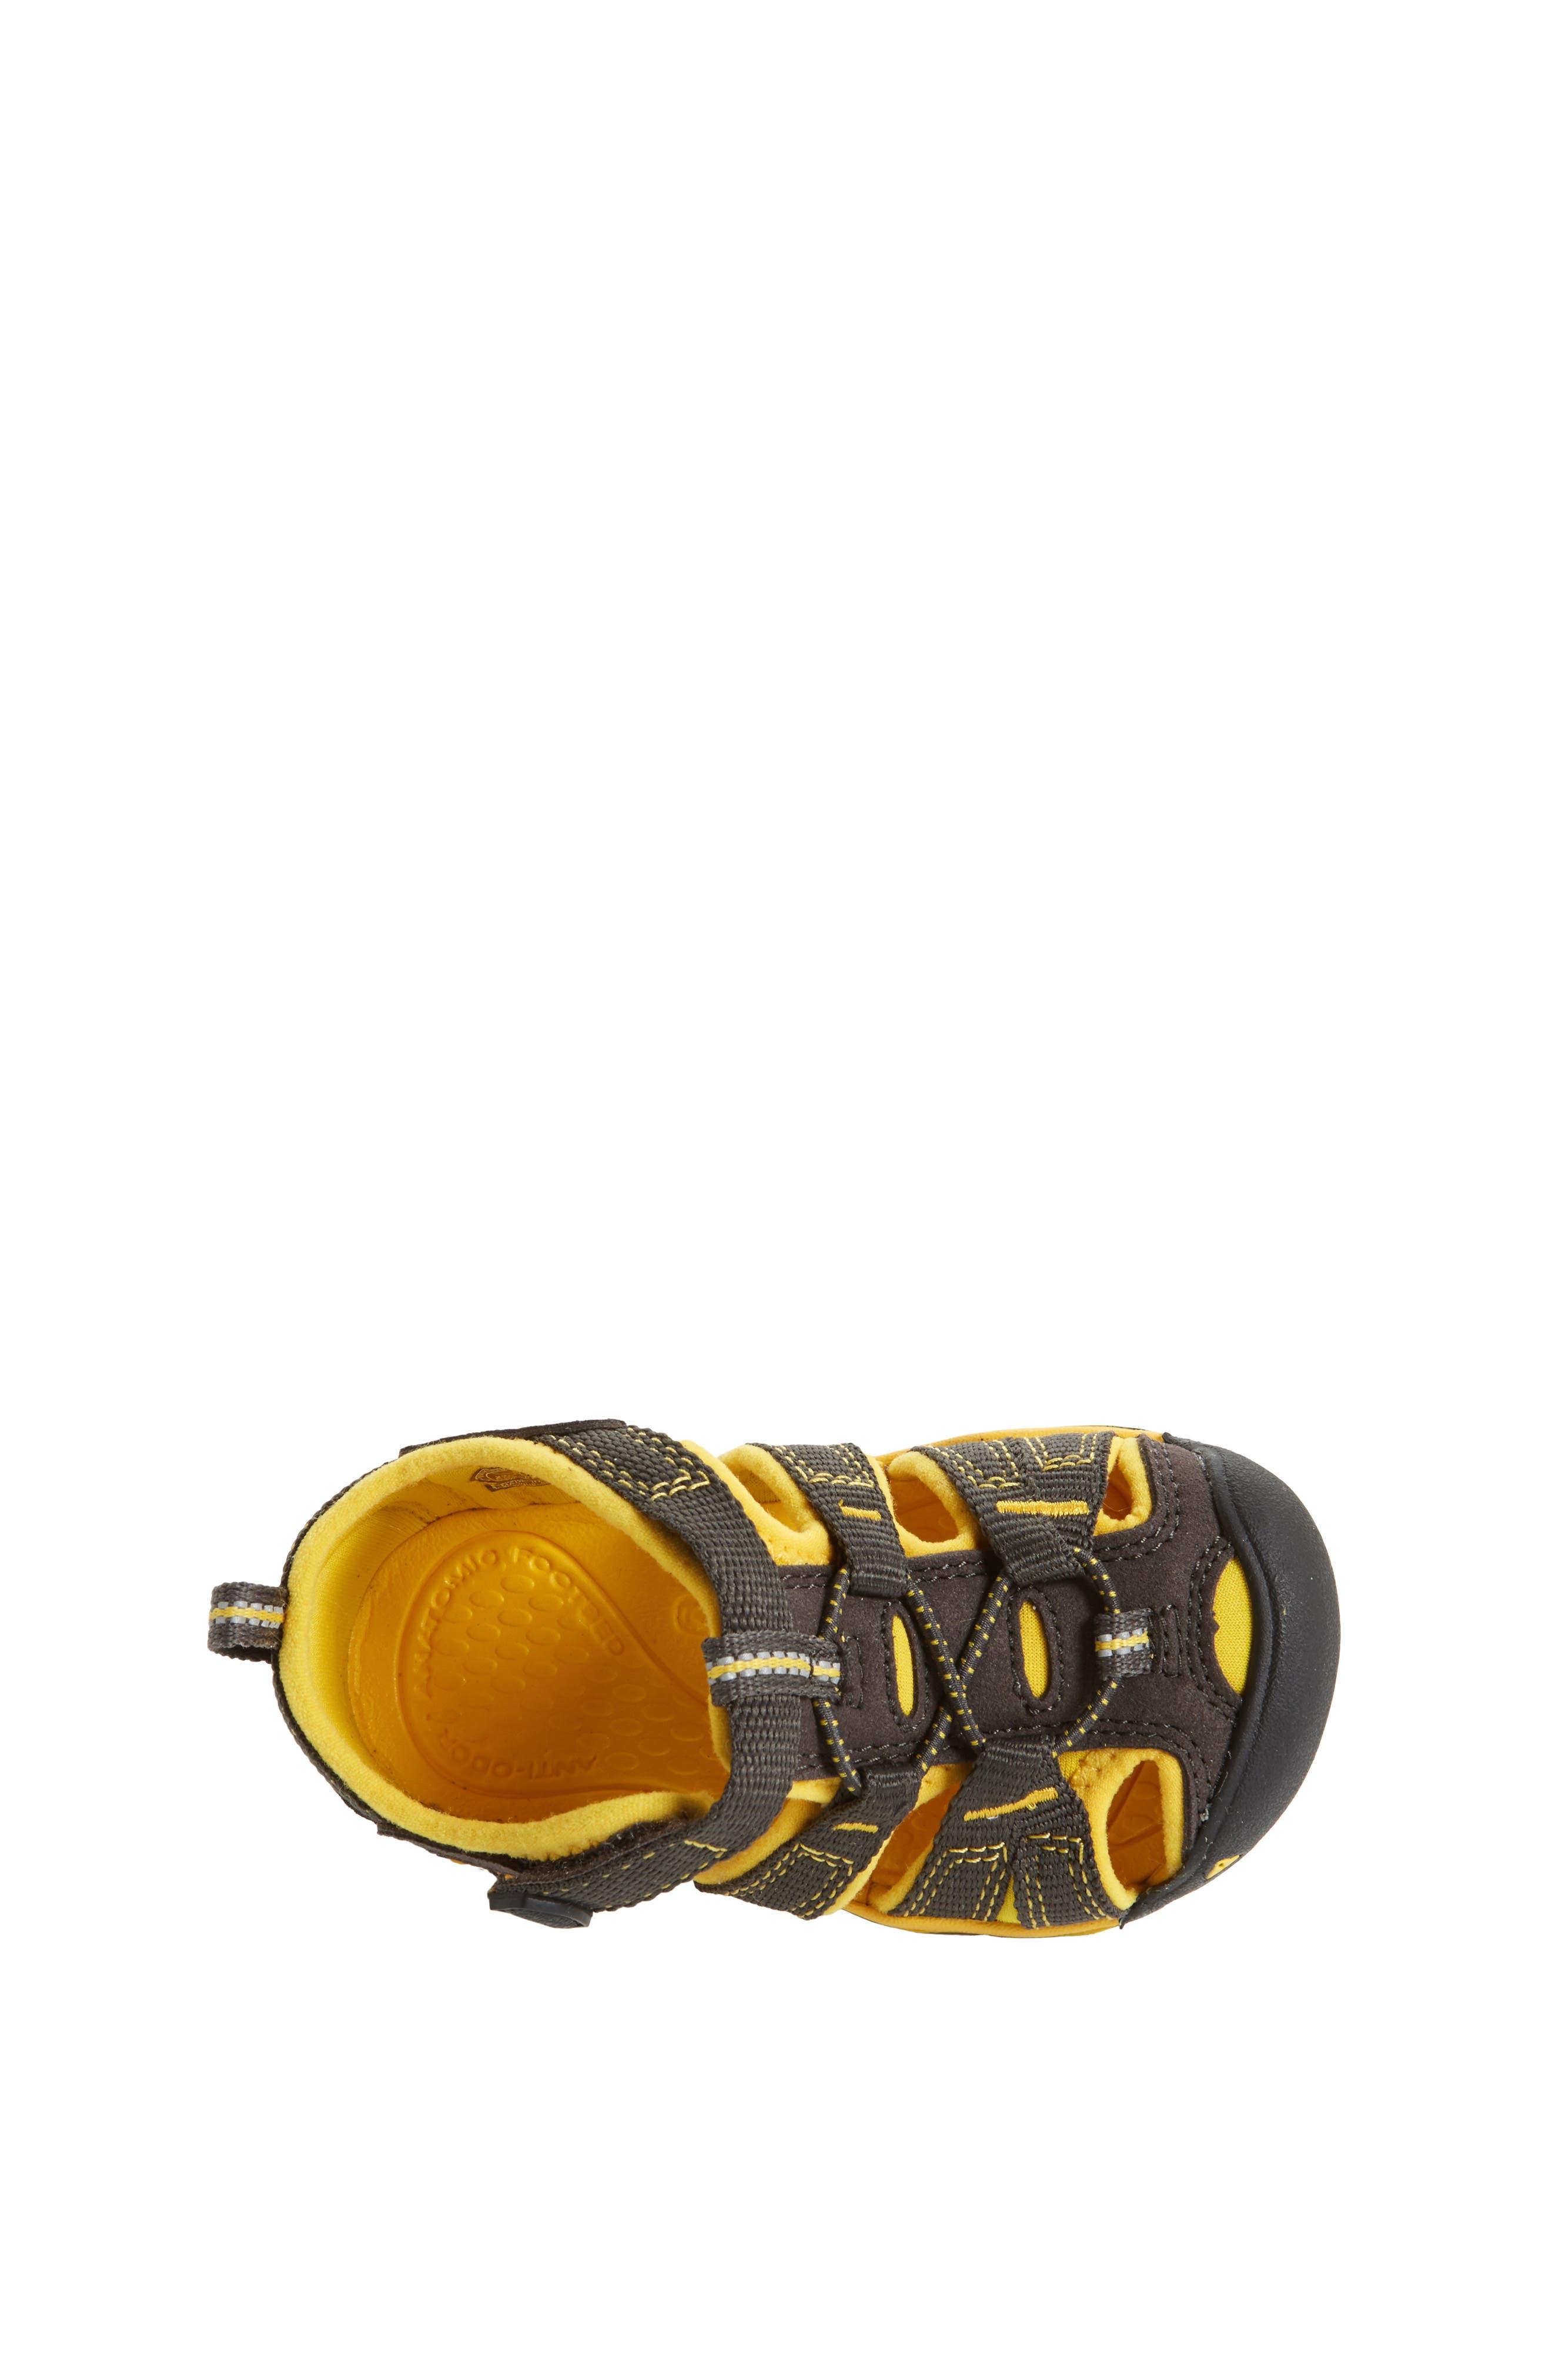 ,                             'Seacamp II' Water Friendly Sandal,                             Alternate thumbnail 107, color,                             001